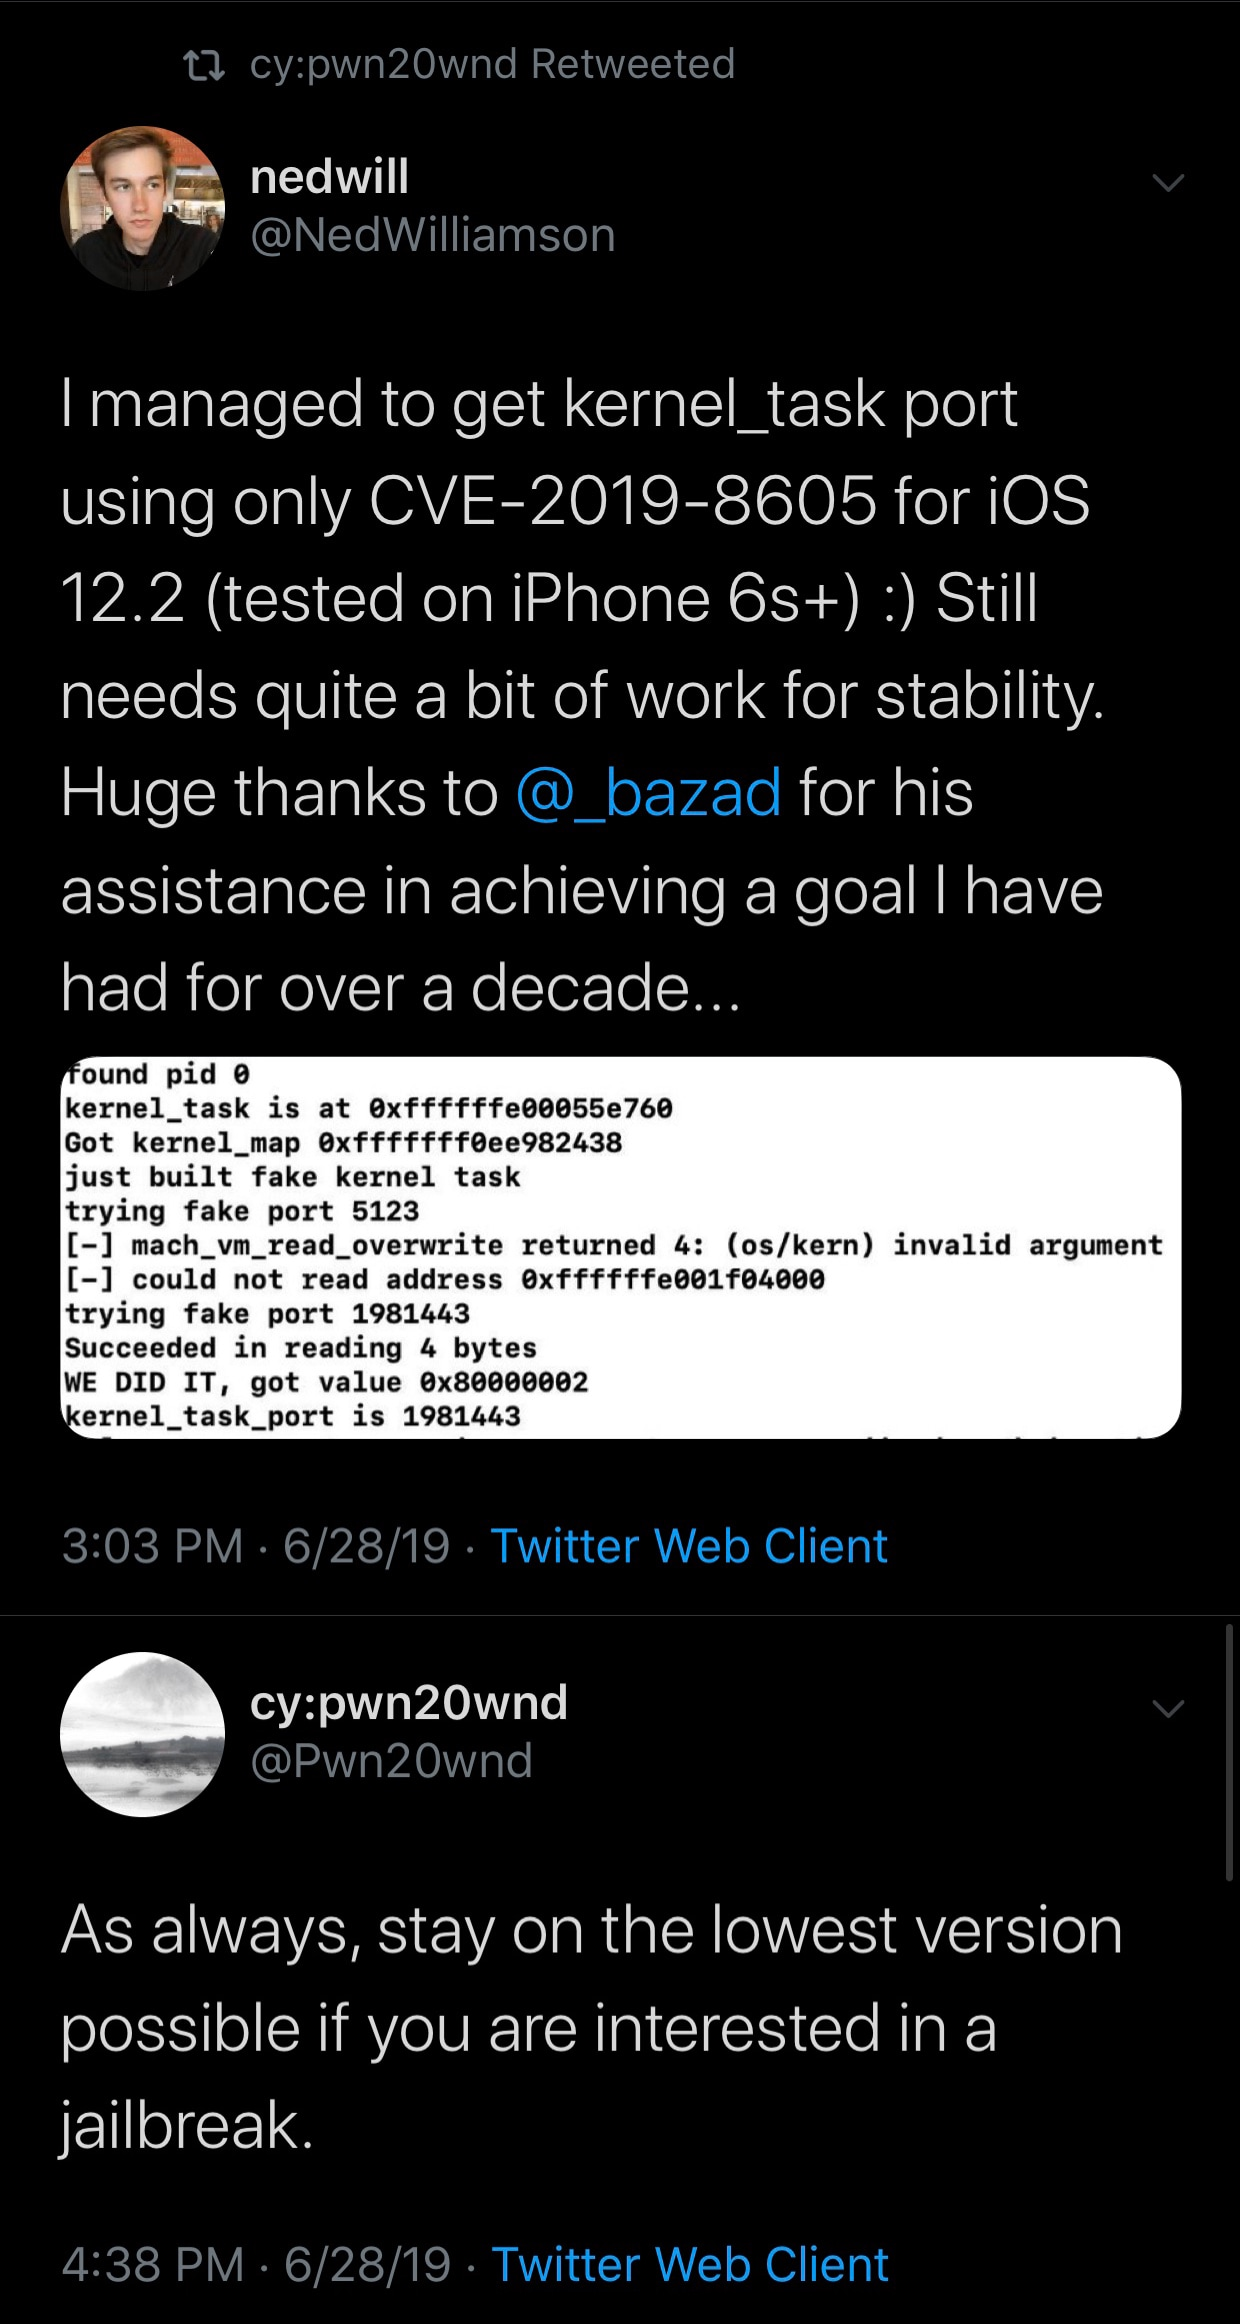 A tfp0 exploit has been achieved on iOS 12 2